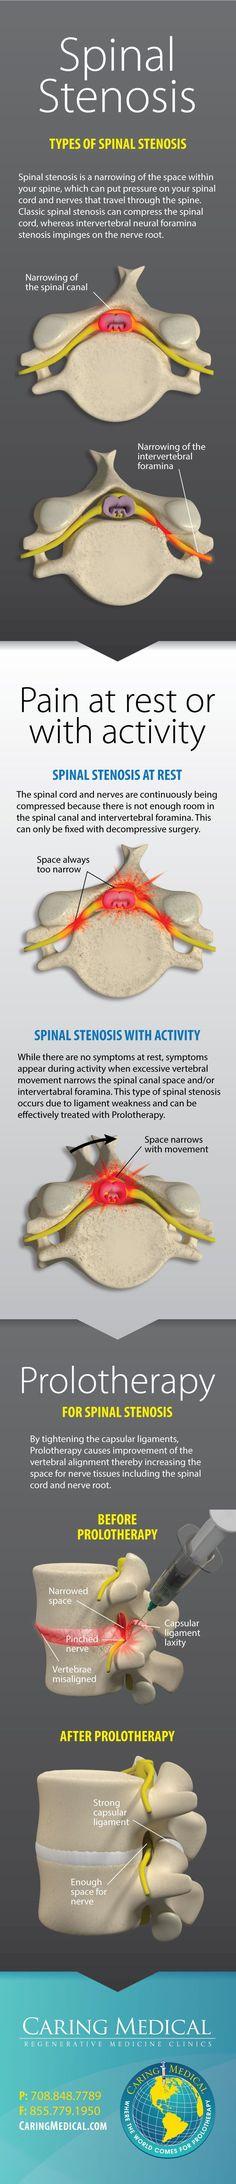 sciatica back pain treatment